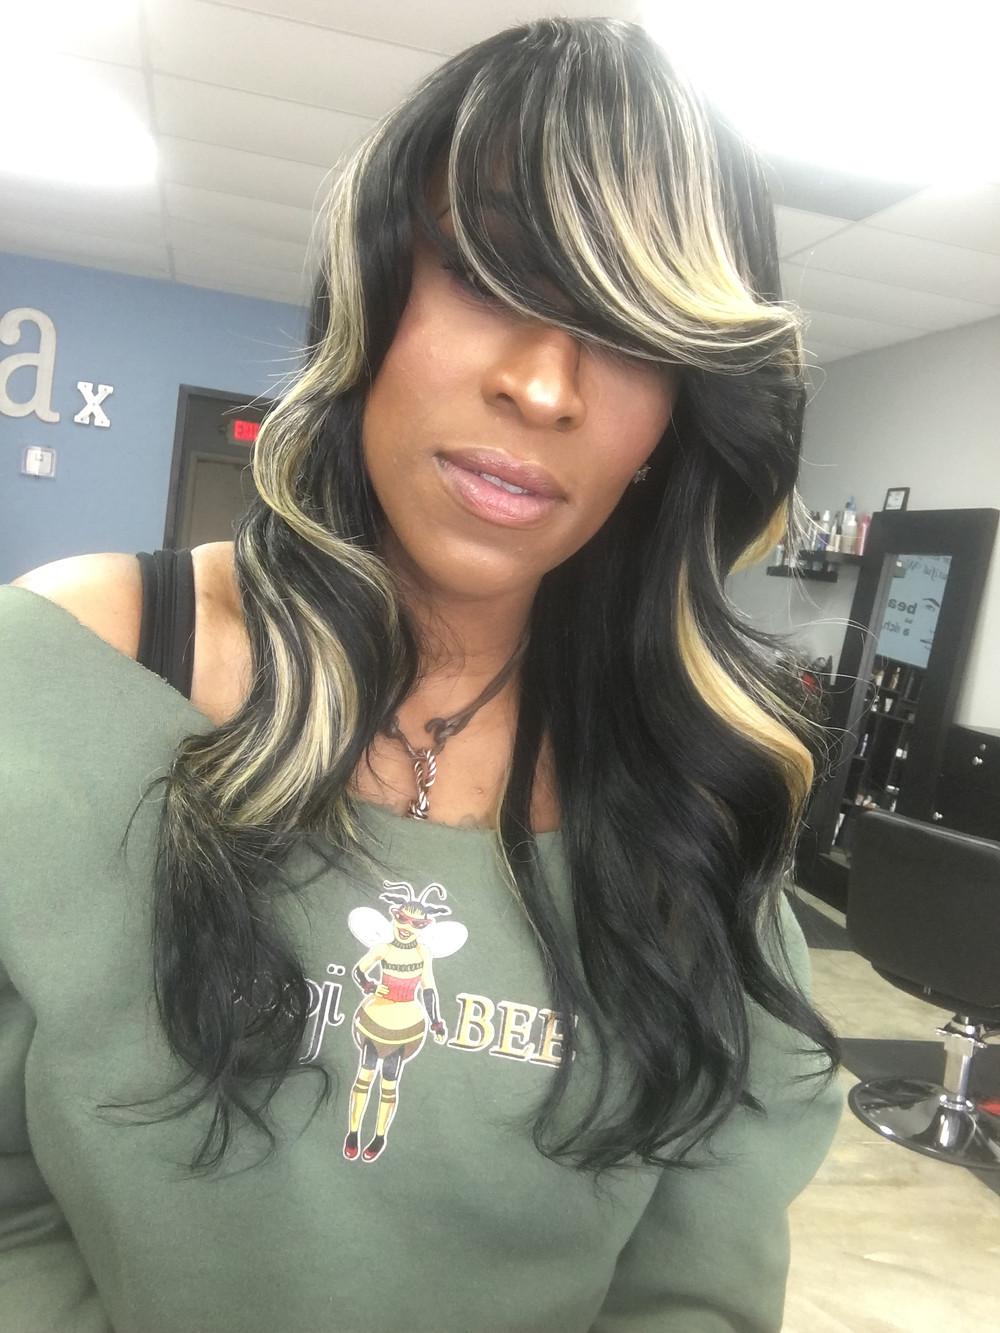 Full wig by BoojiBEE!